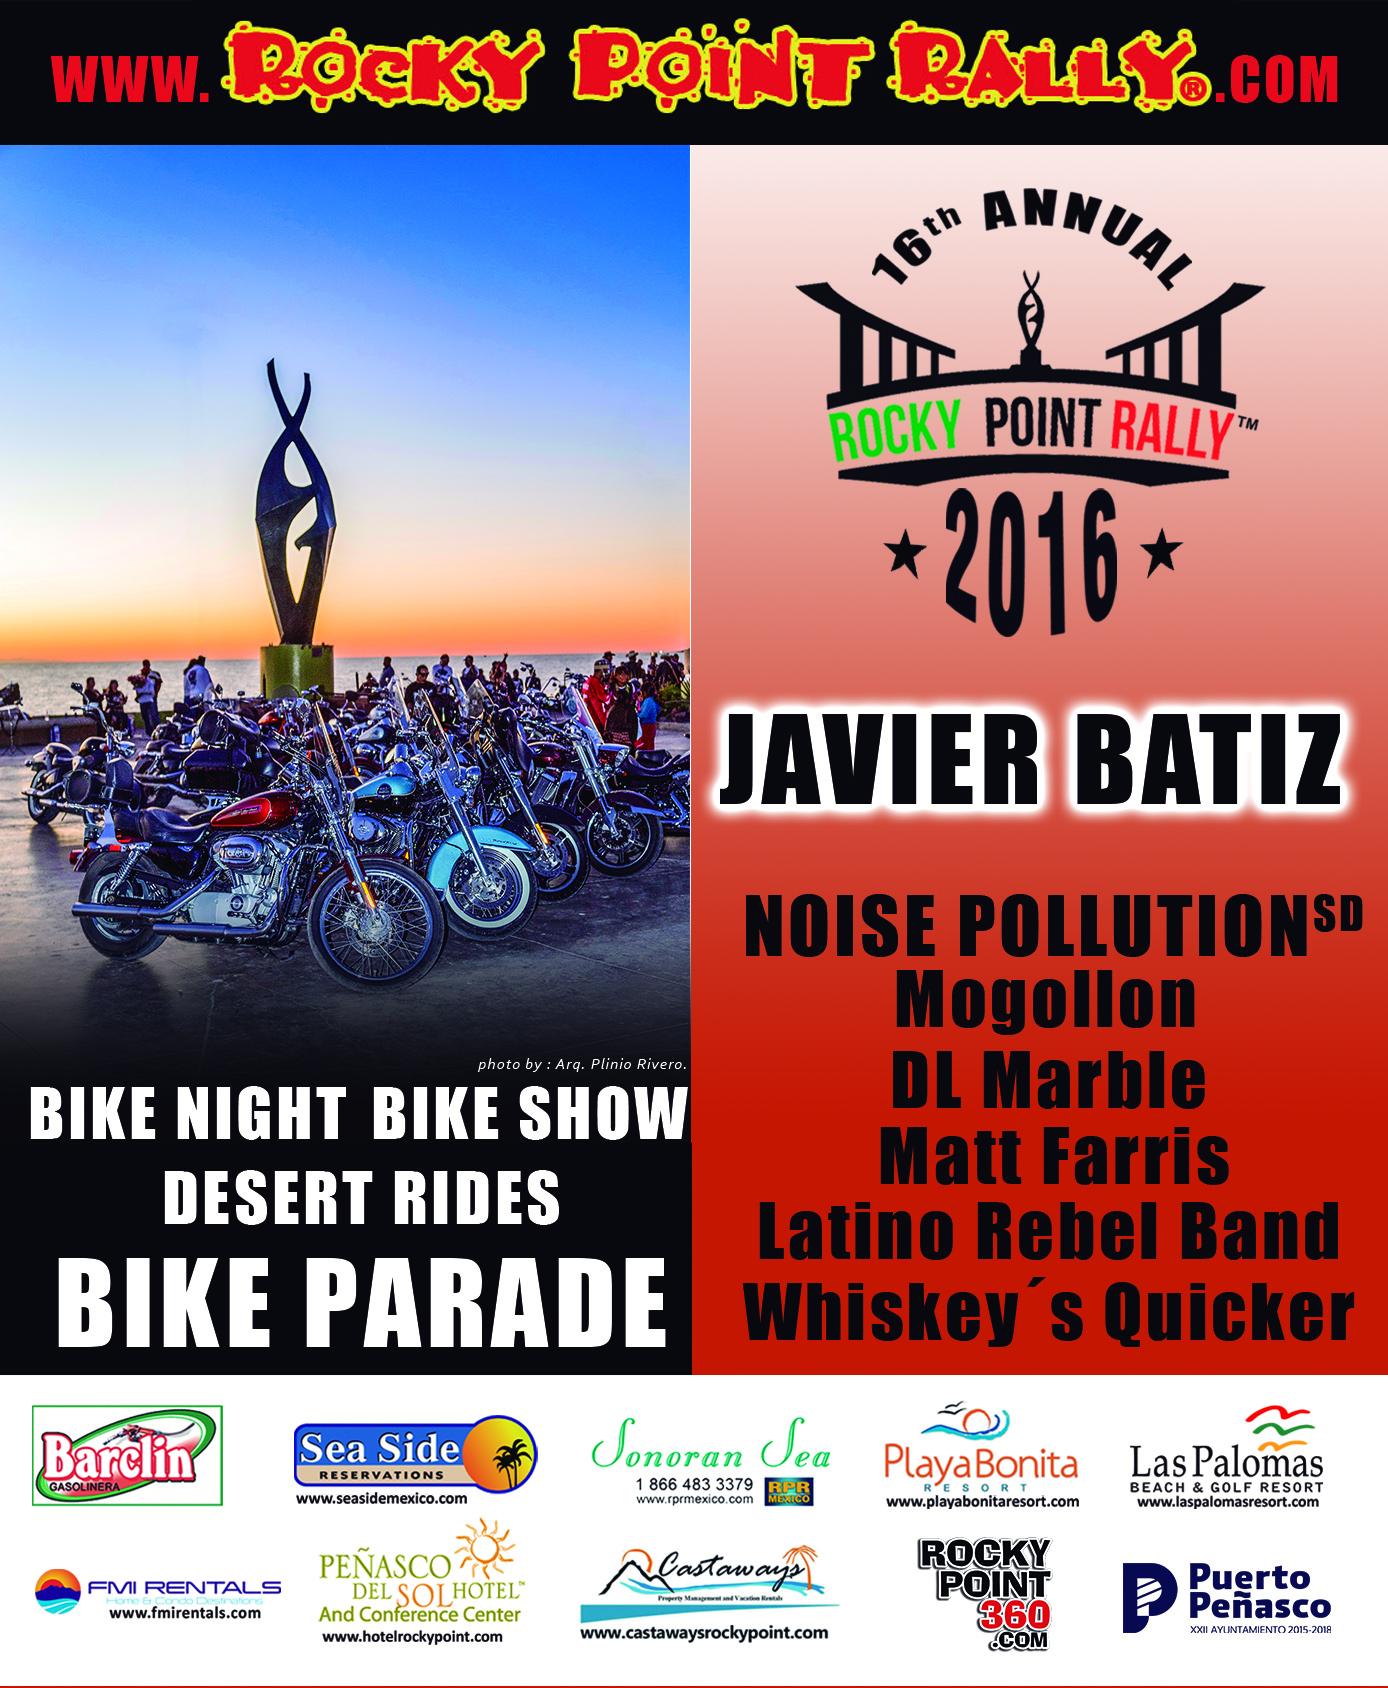 National black bikers roundup 2016 - Postcard Rrp Back 01